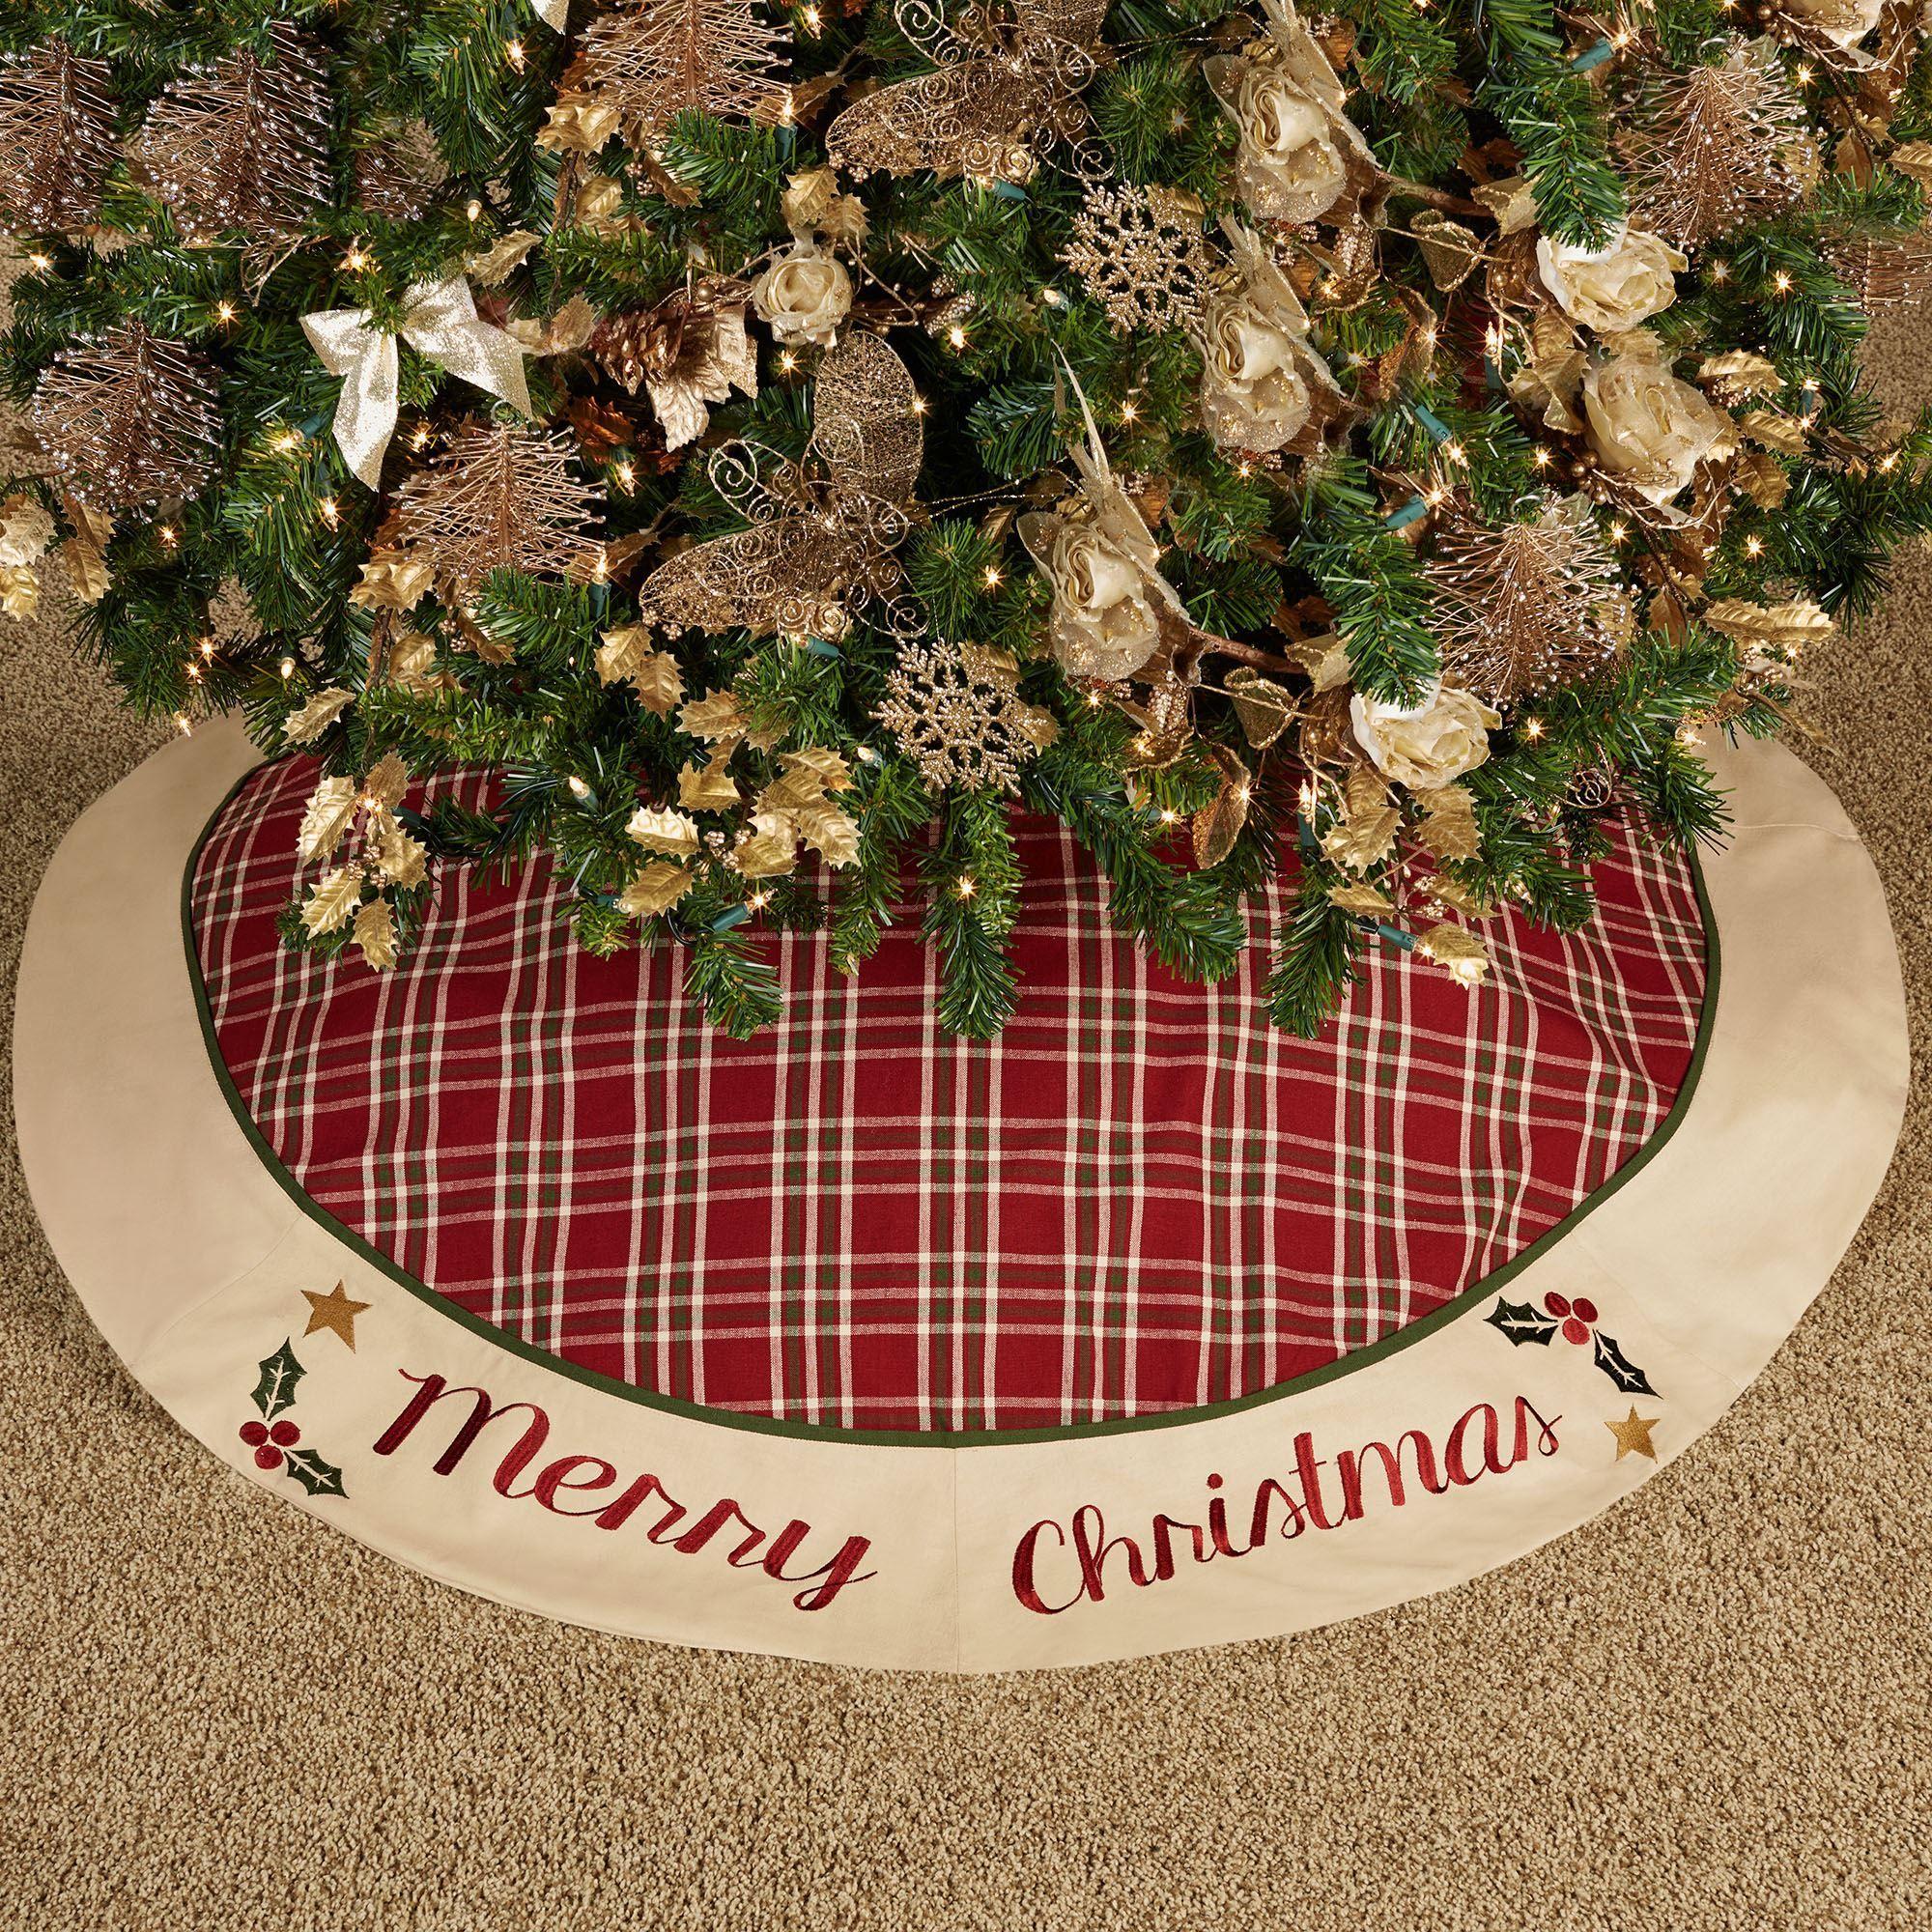 Merry Christmas Plaid Tree Skirt